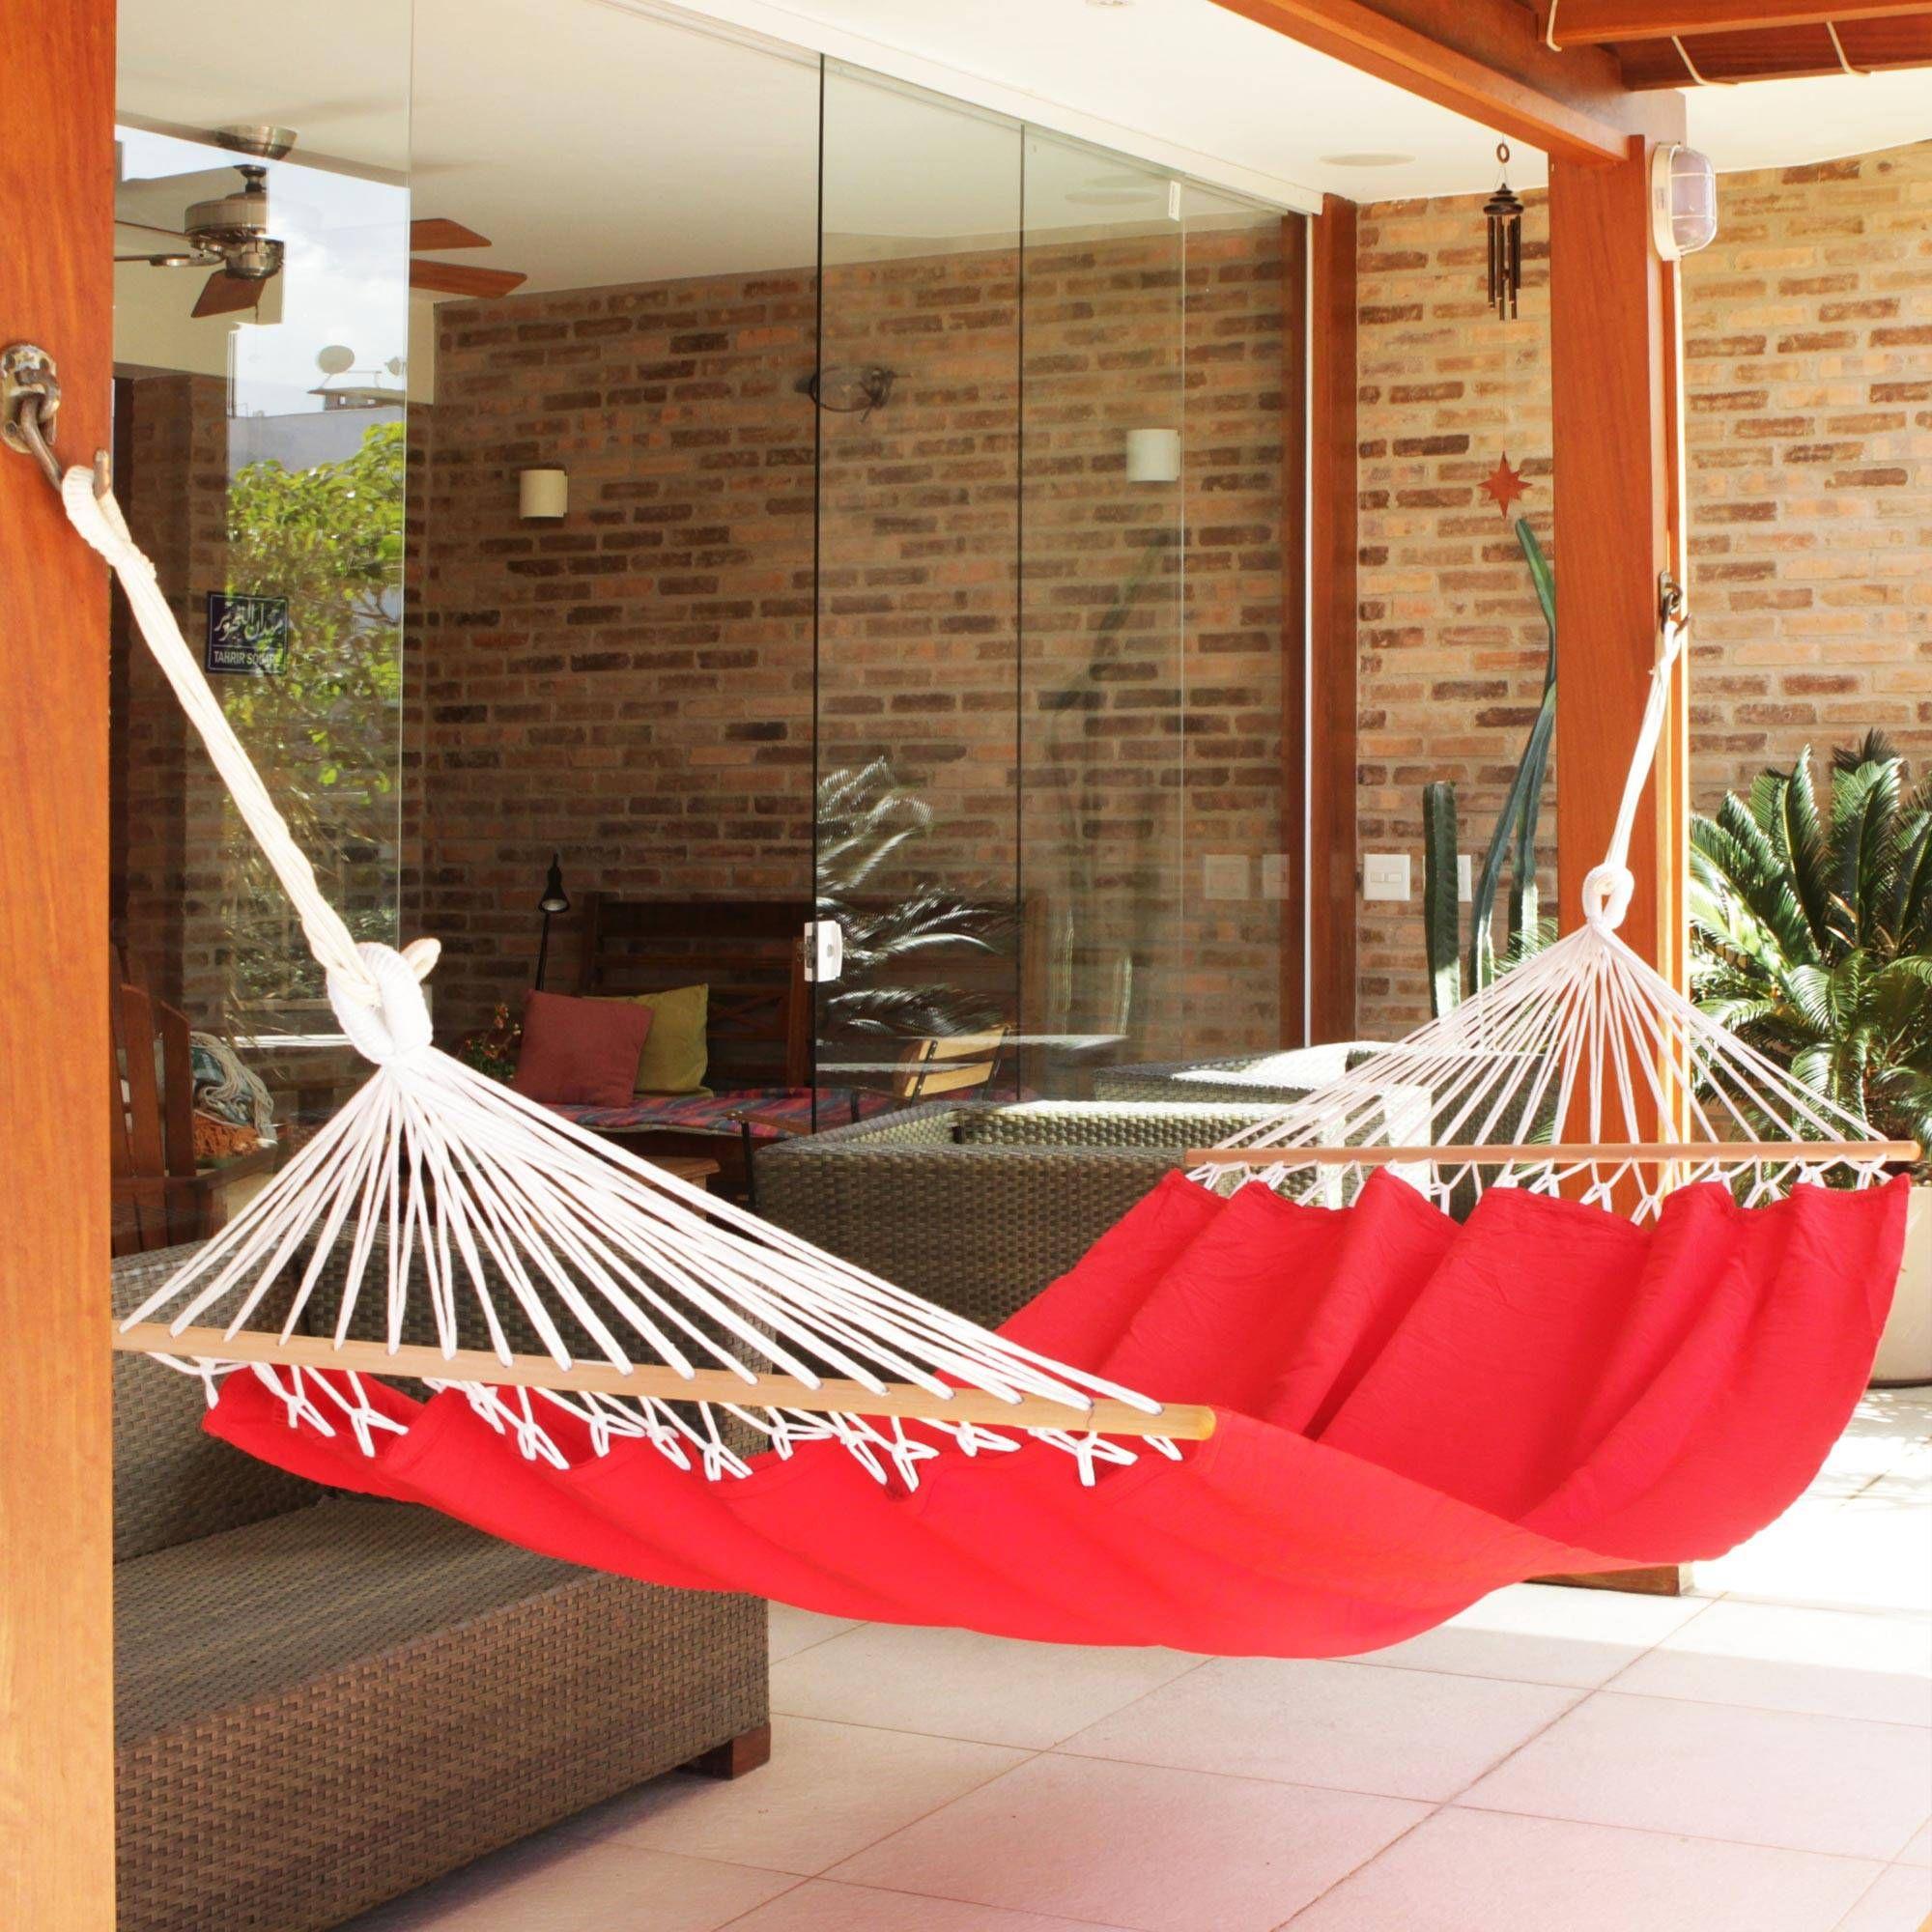 Single bar hammock